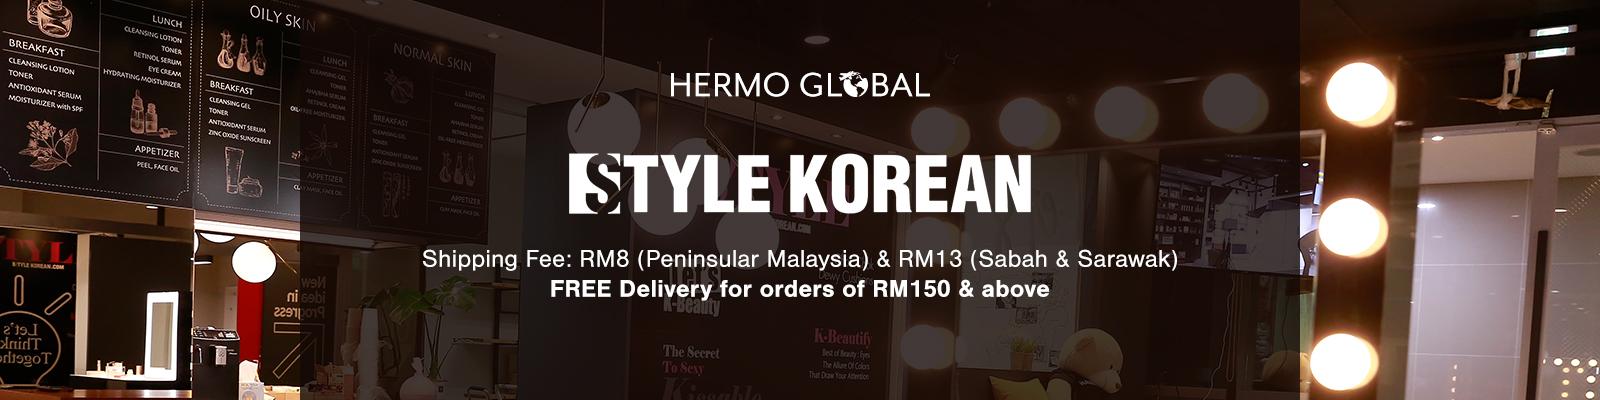 Stylekorean HERMO Global